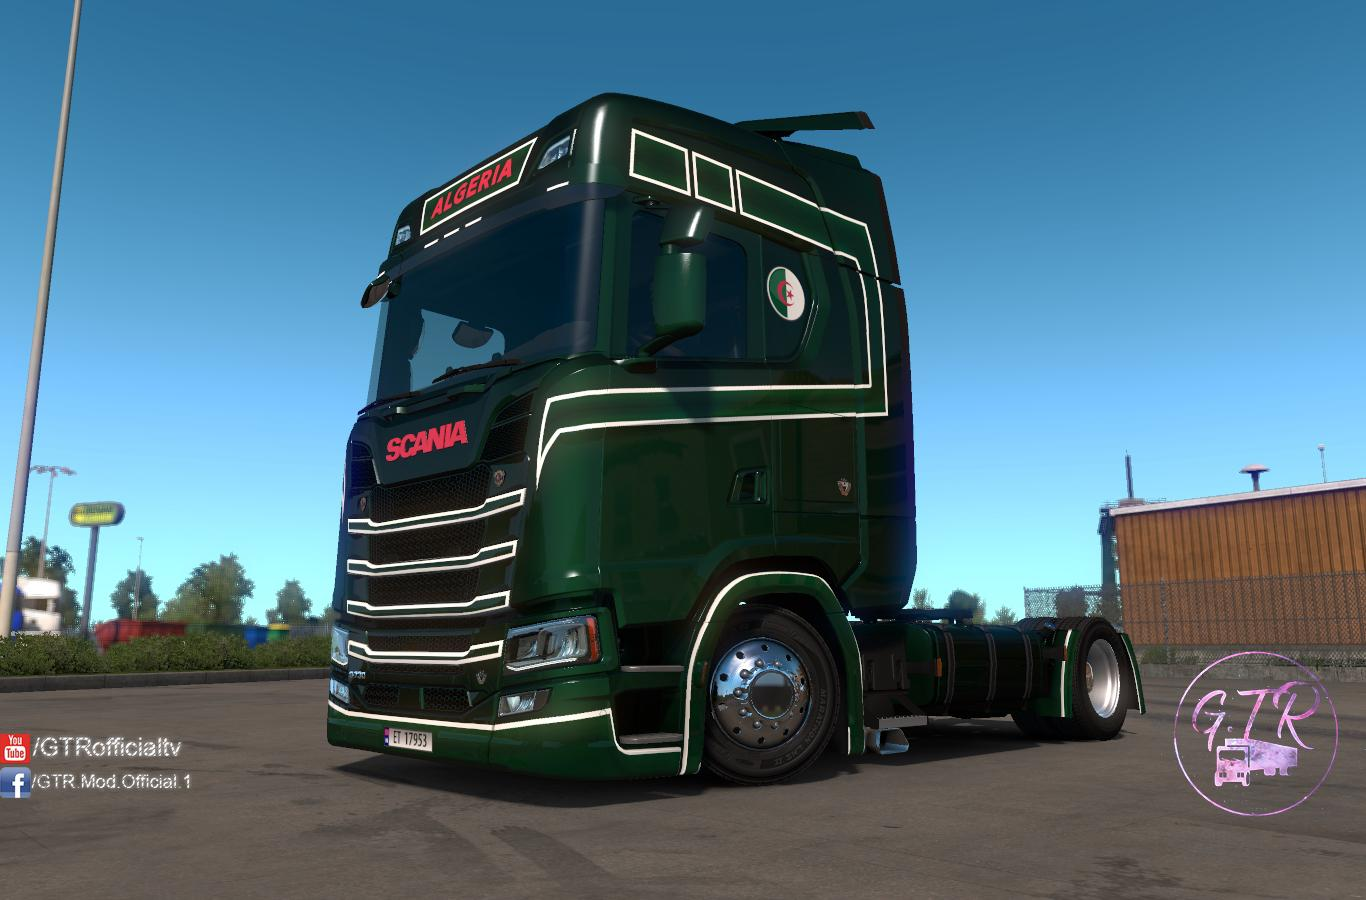 ETS2 - Scania S Next Gen Algeria Skin (1.35.X)